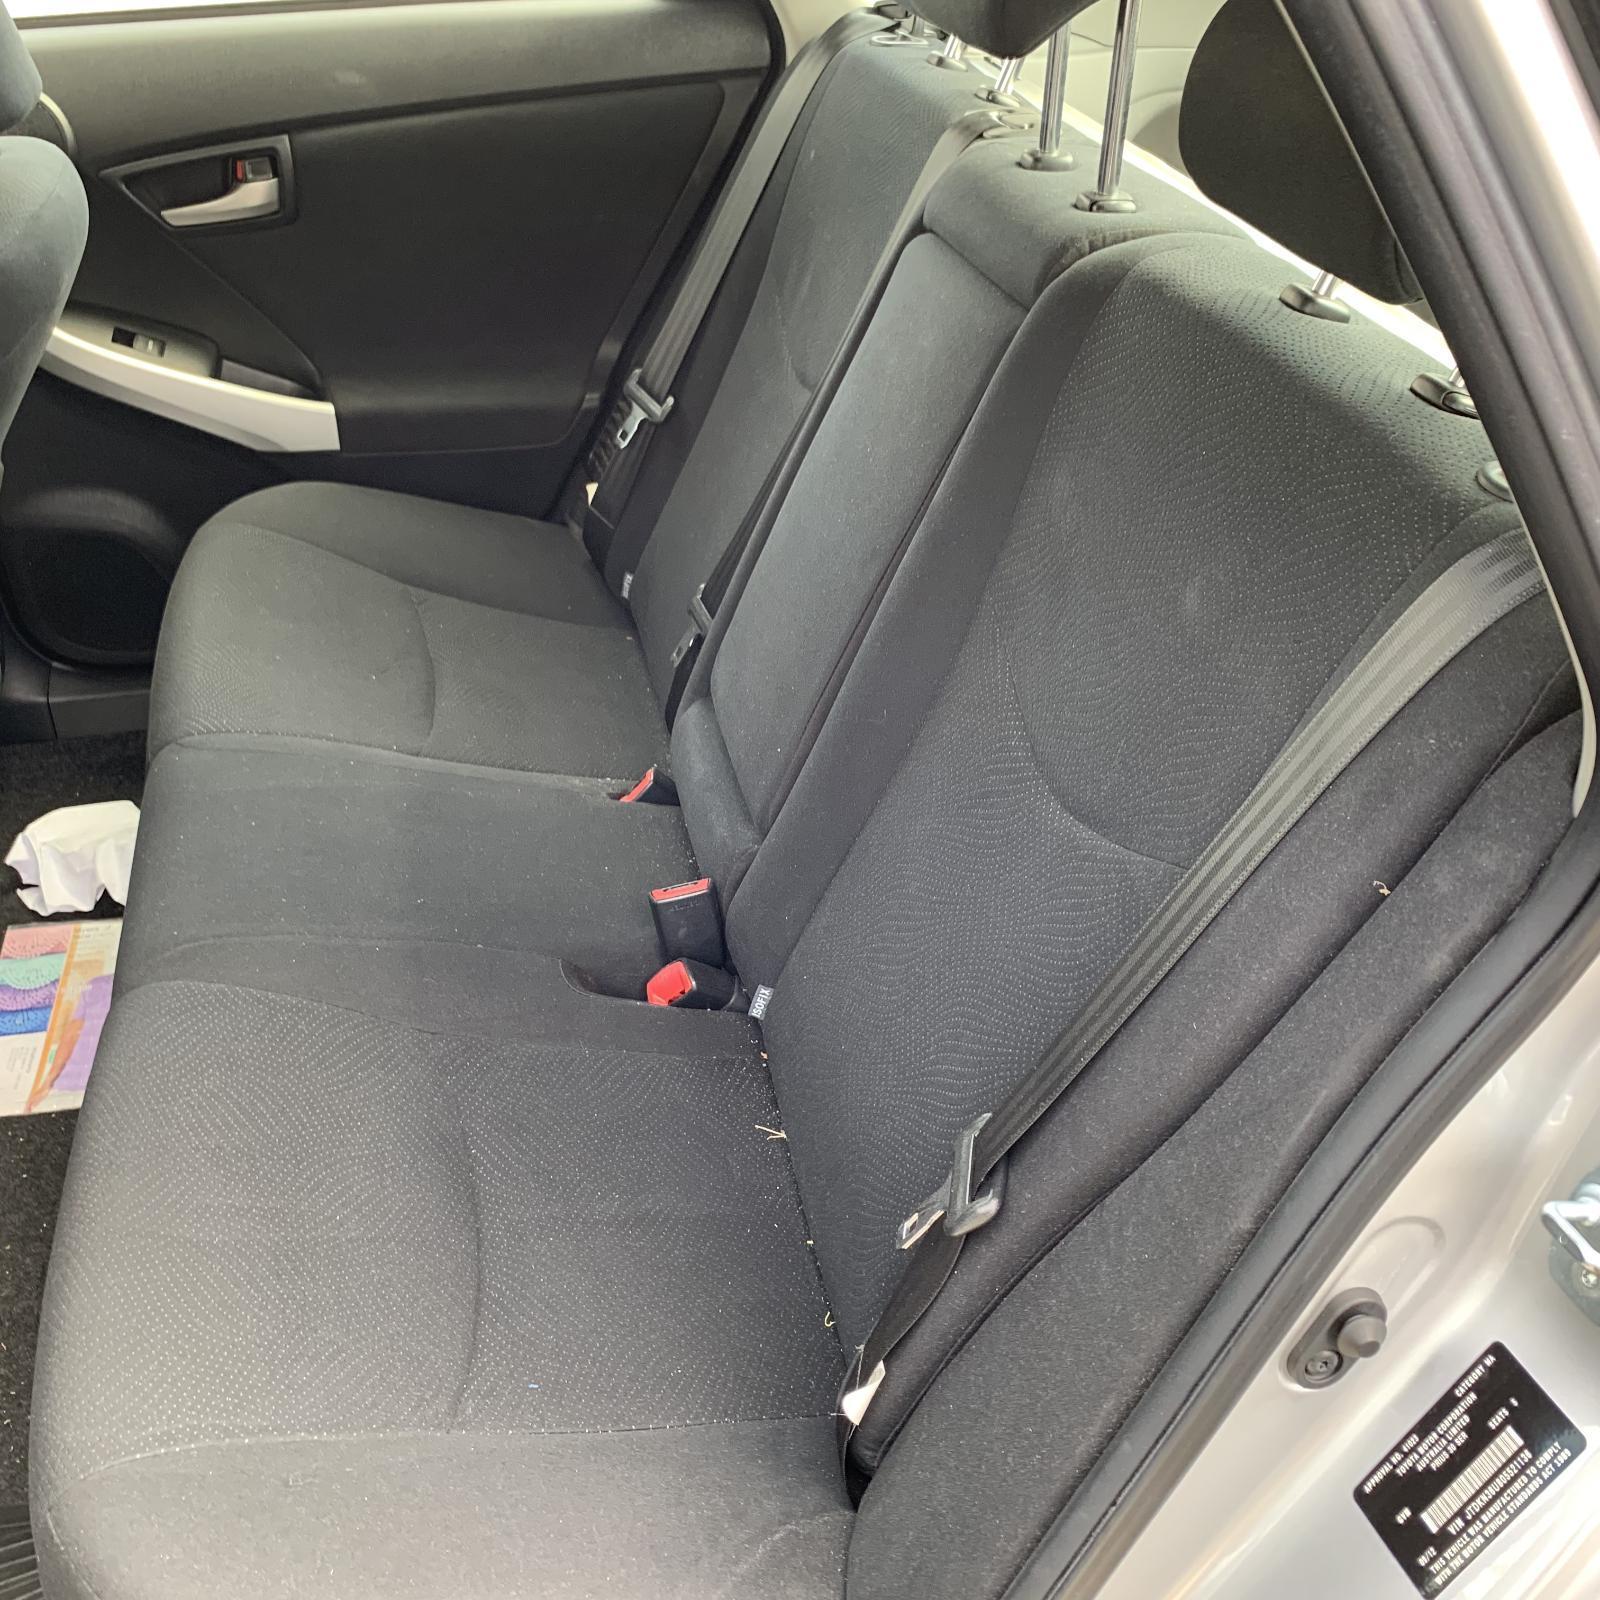 TOYOTA PRIUS, 2nd Seat (Rear Seat), LH REAR, ZVW30R, CLOTH, GREY, 07/09-12/15